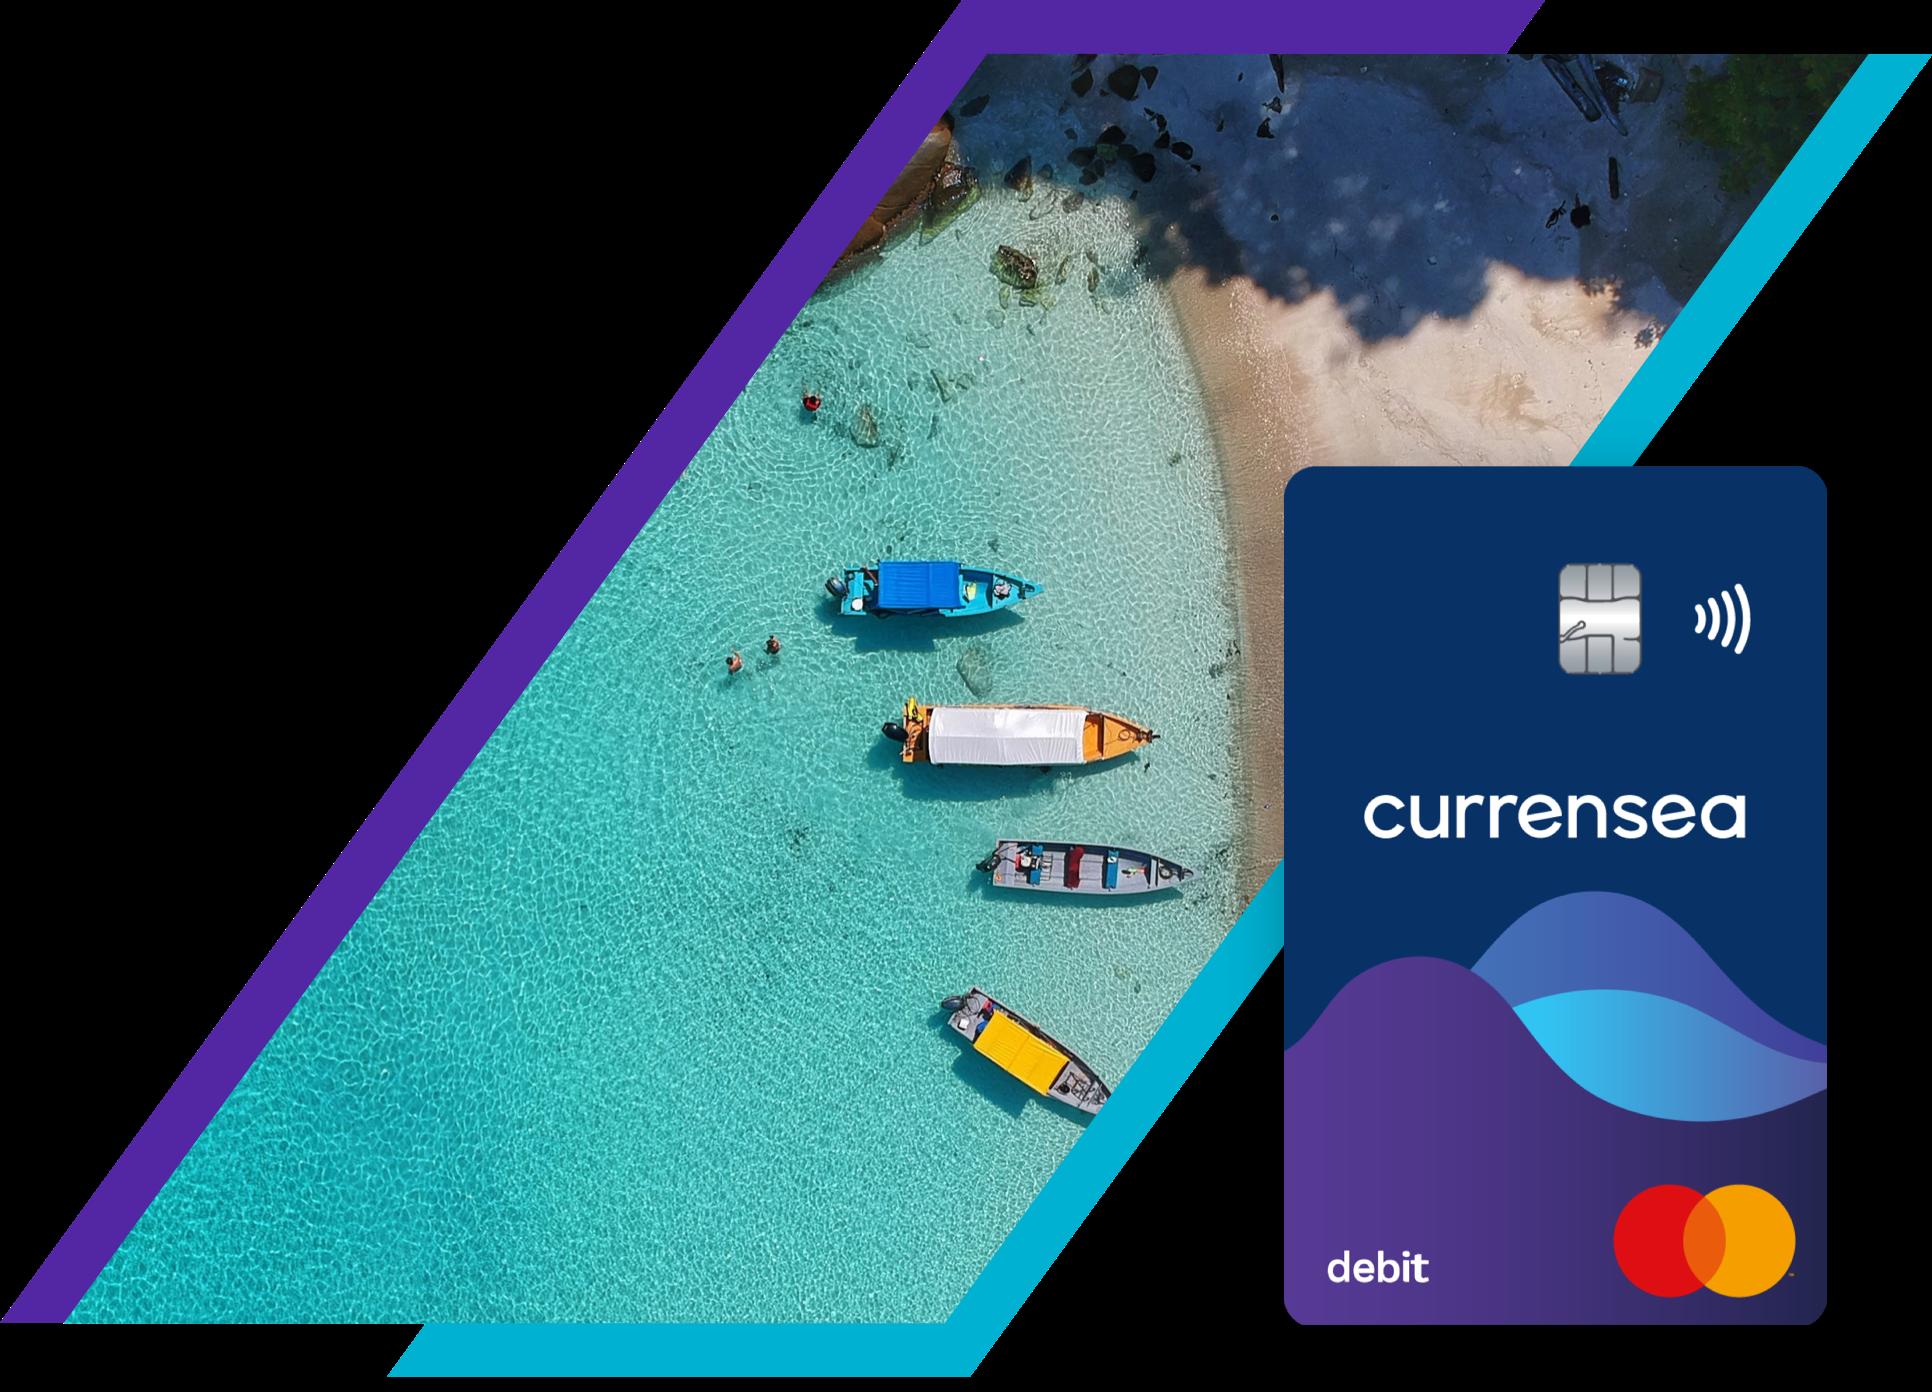 How Currensea compares for desktop